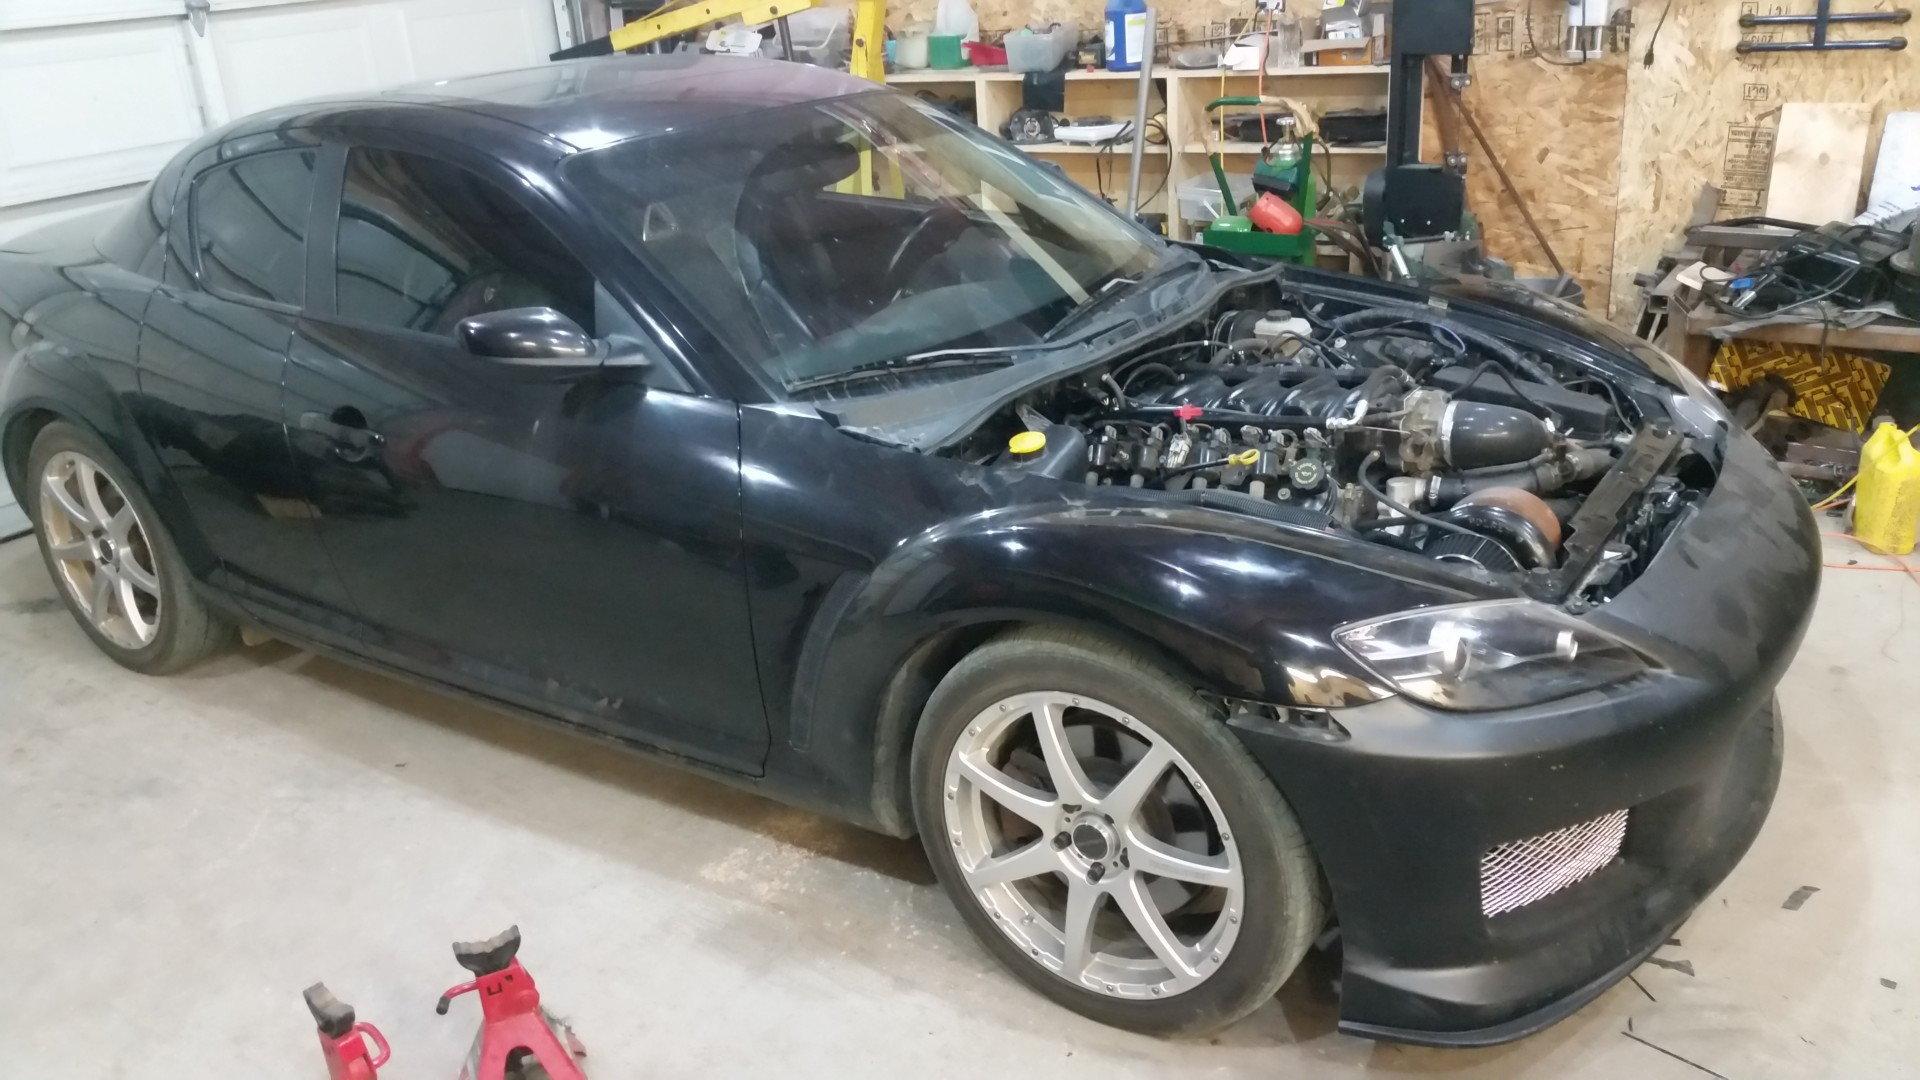 RX8 5 3 Turbo - LS1TECH - Camaro and Firebird Forum Discussion